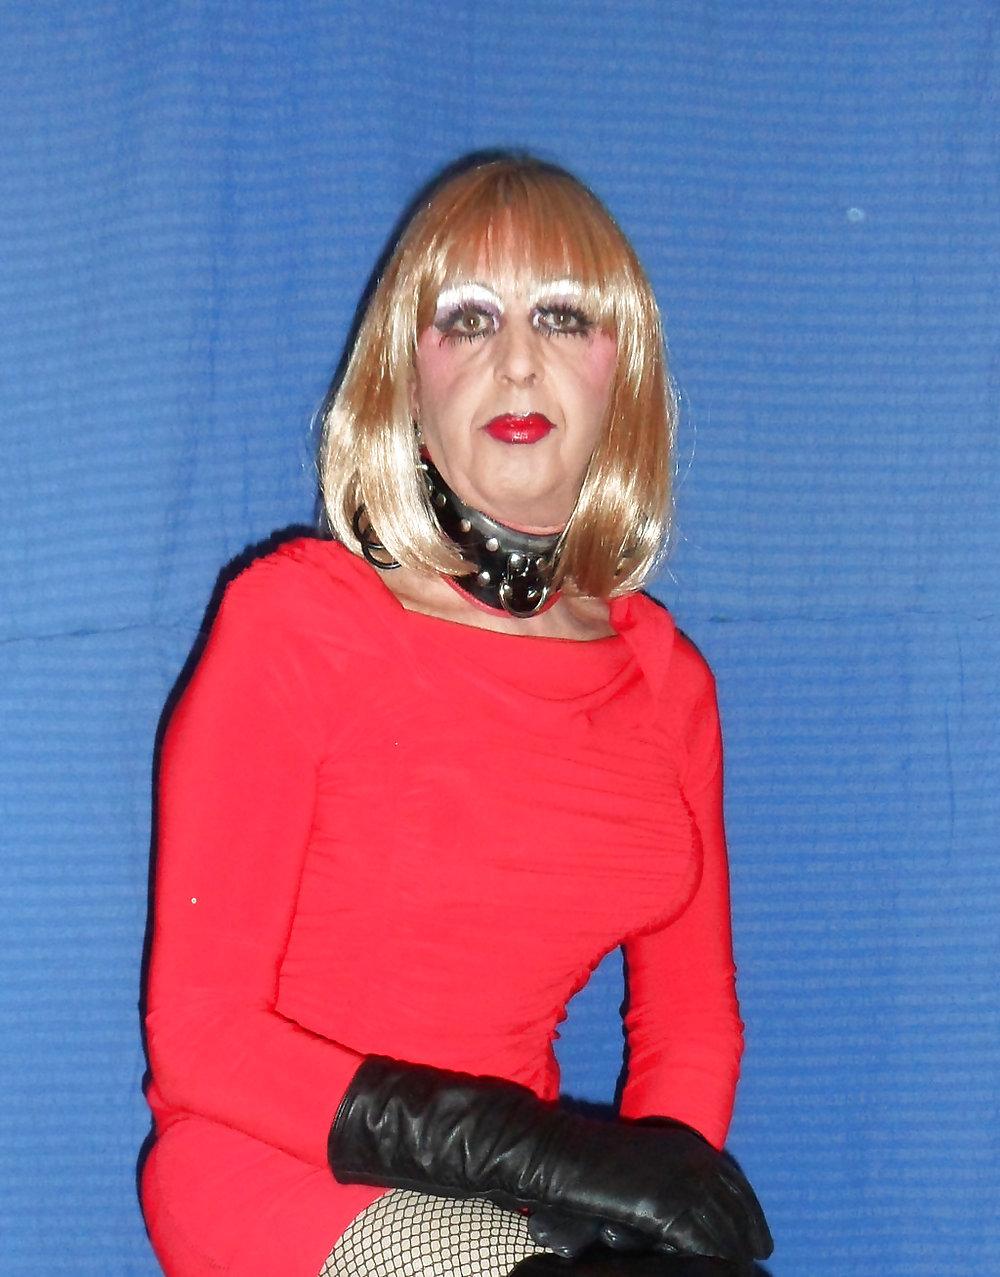 anna nicole fox transsexual photos